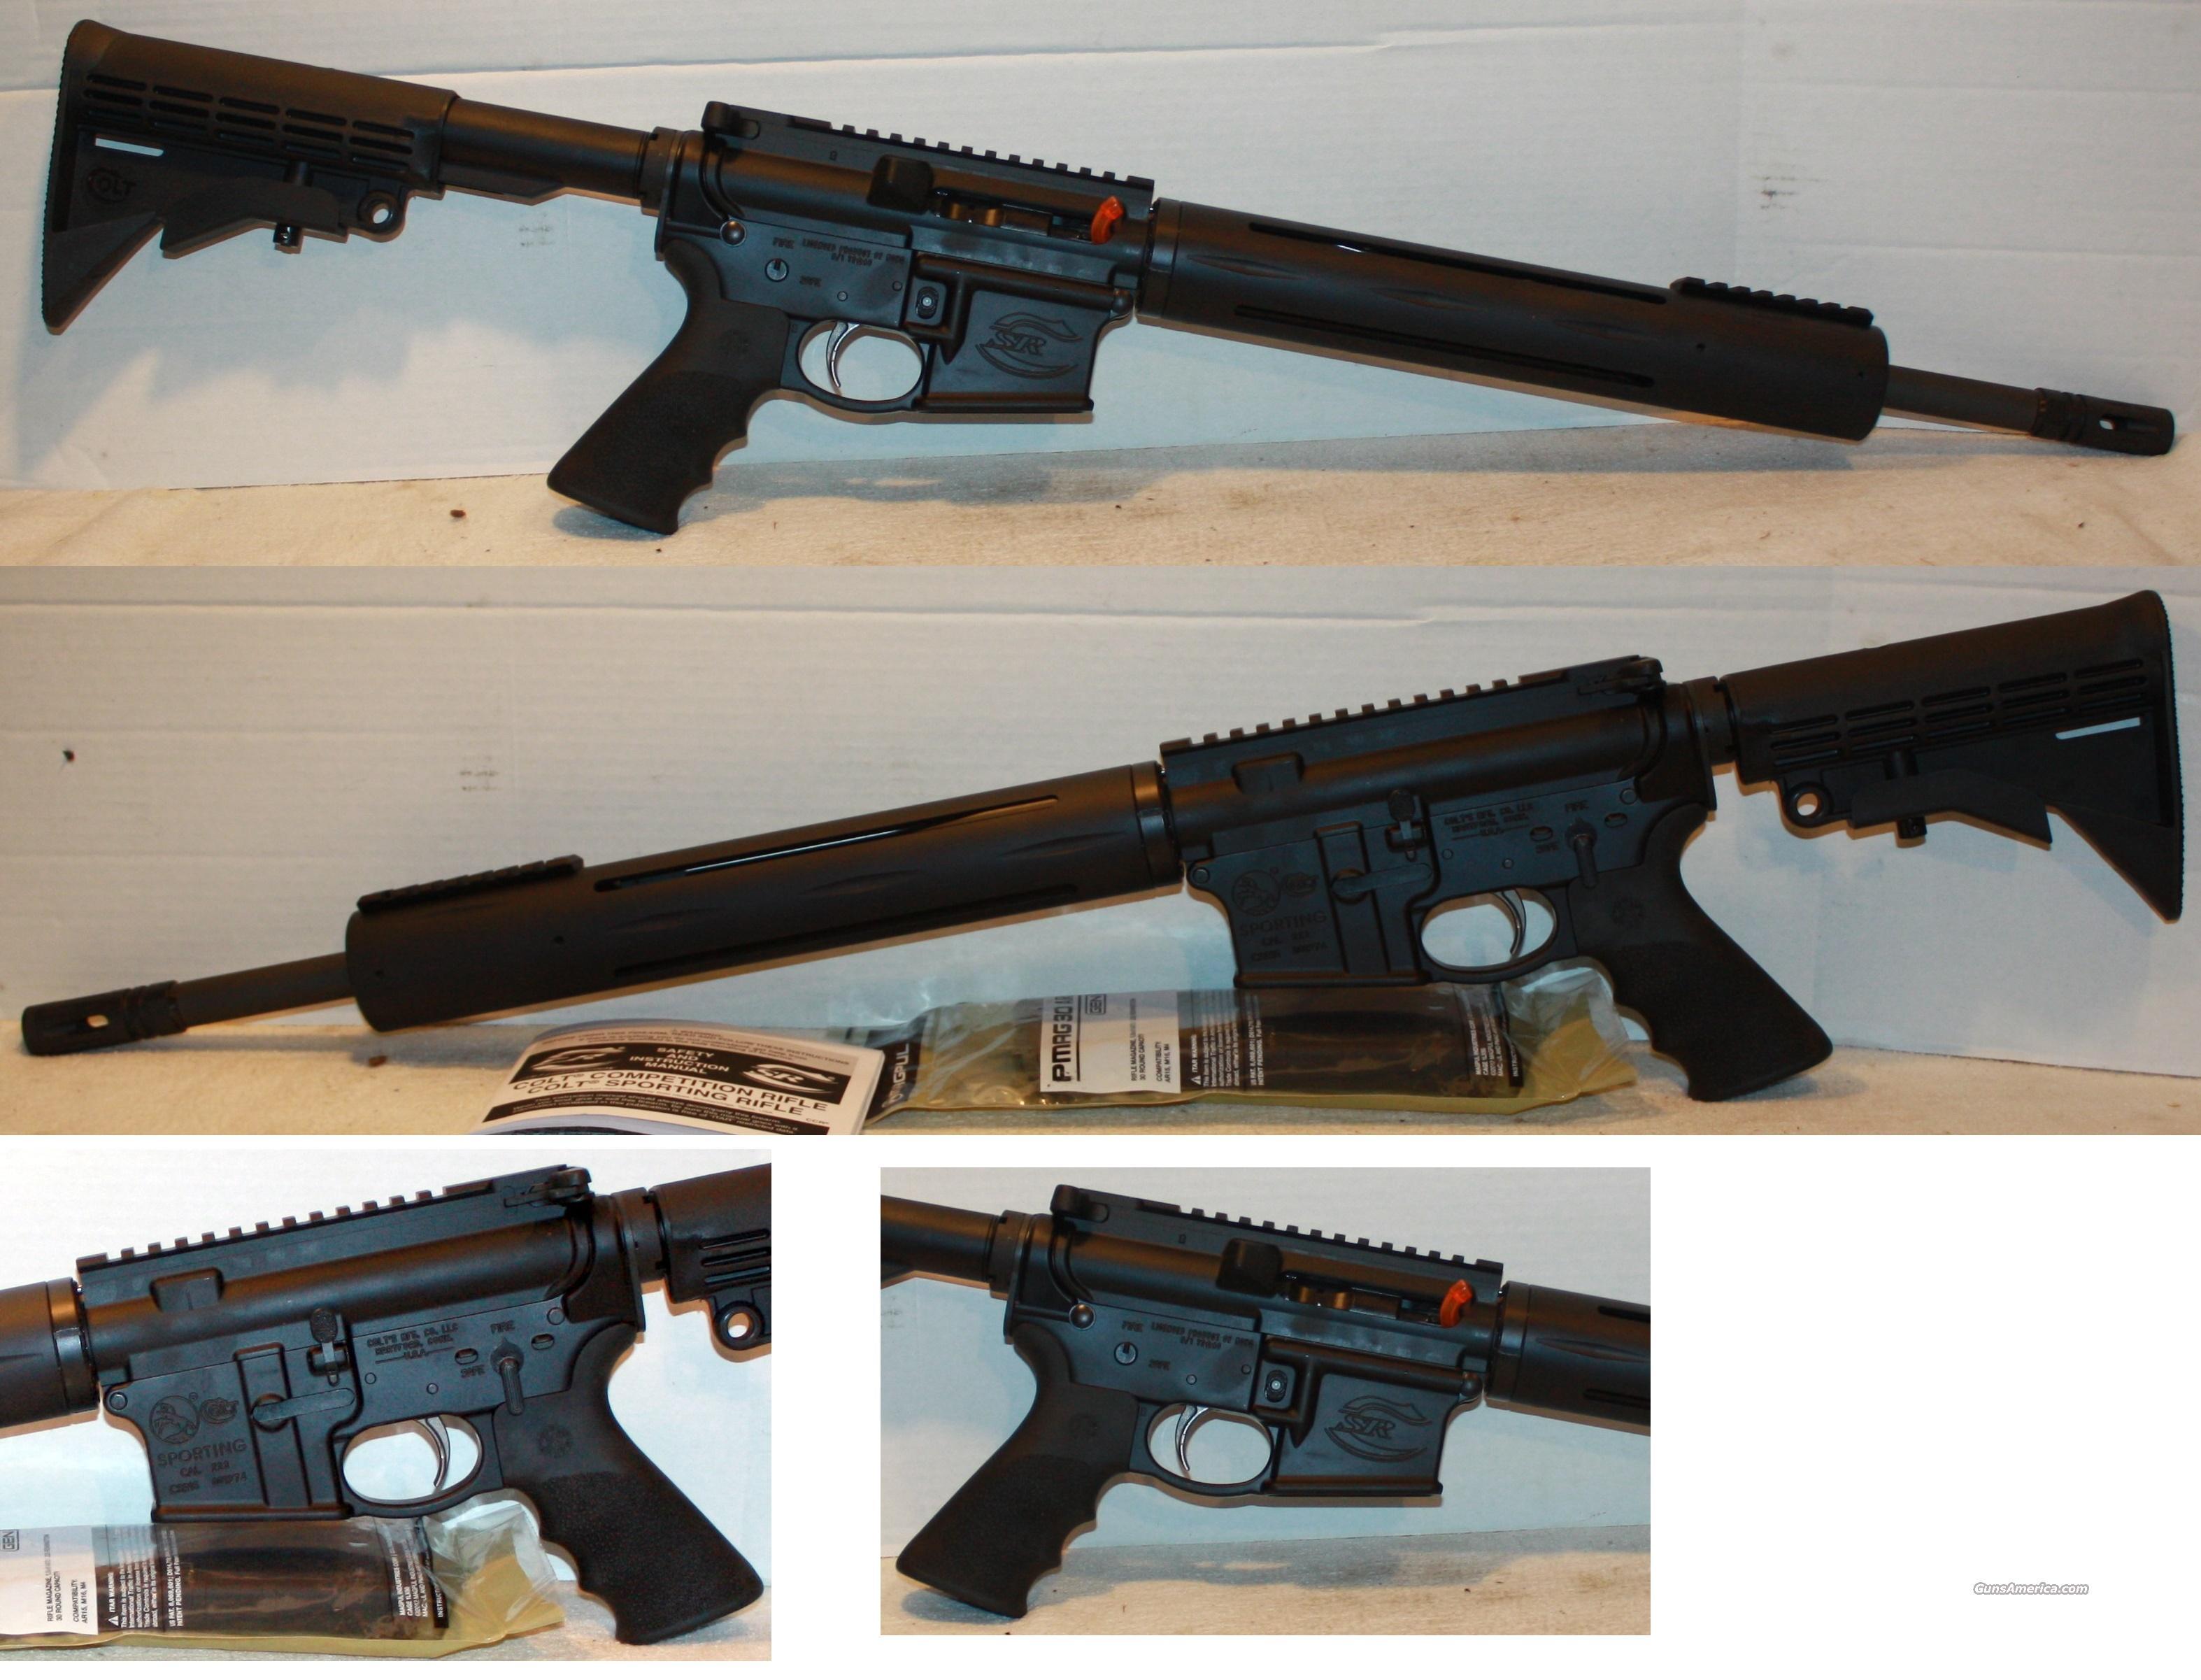 colt competition rifle csr 1516 ar 15 carbine sa 223 5. Black Bedroom Furniture Sets. Home Design Ideas